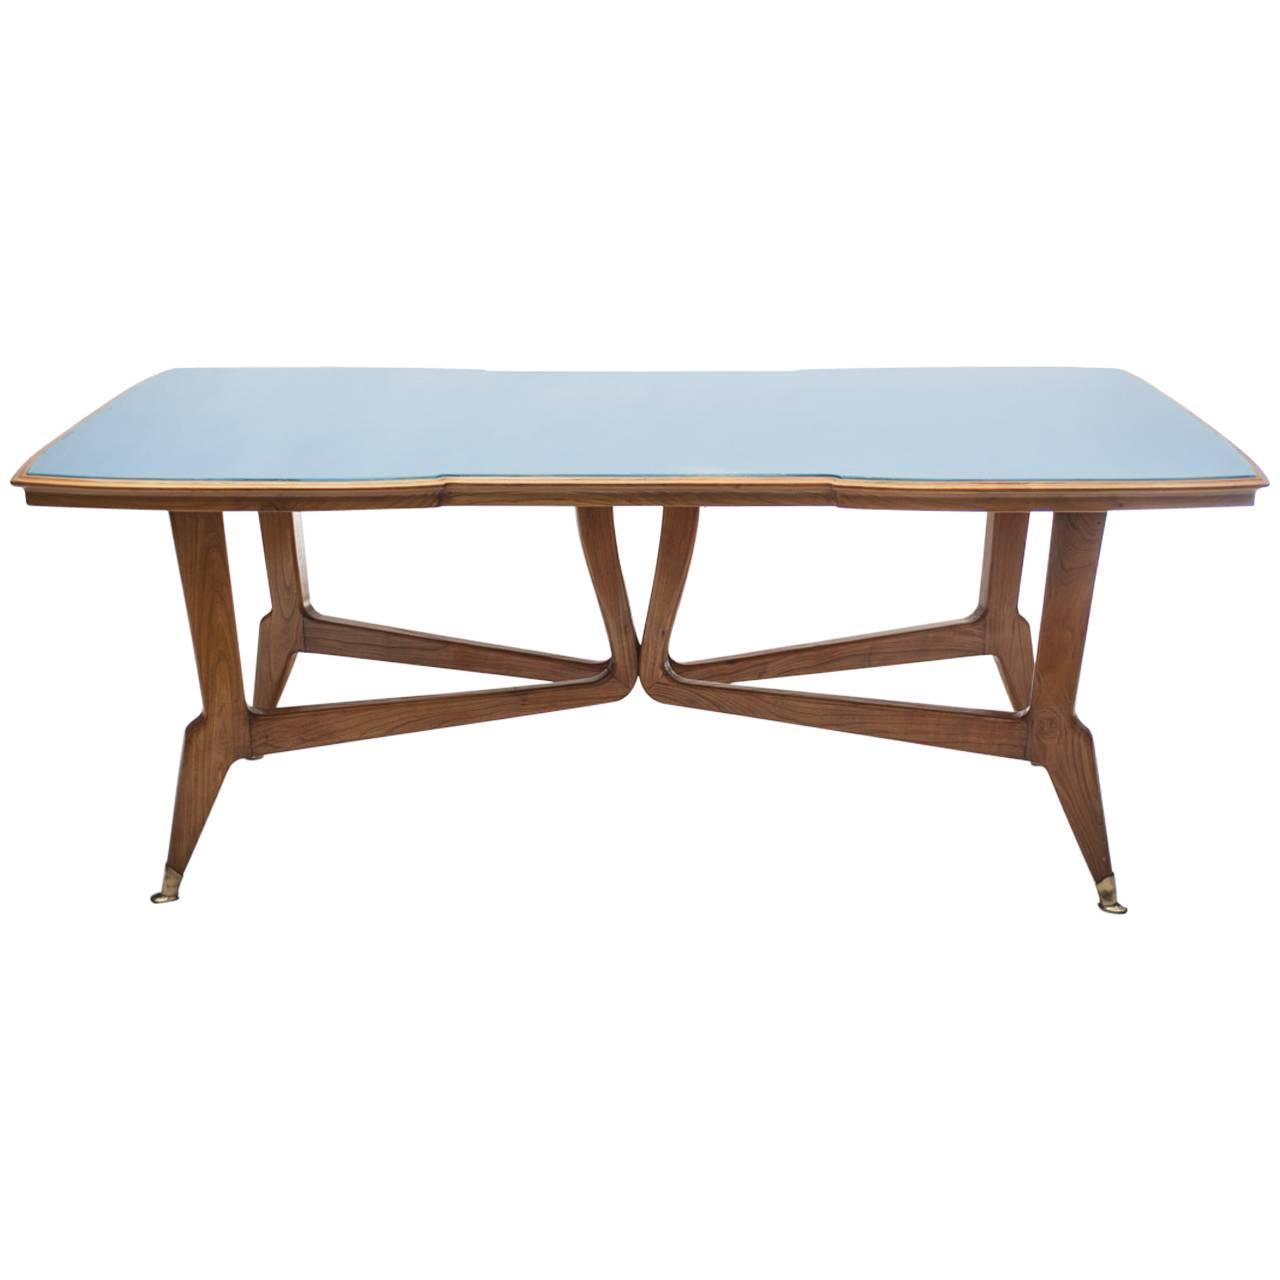 Dining table 50s italian design modernism dining table 50s italian design geotapseo Image collections